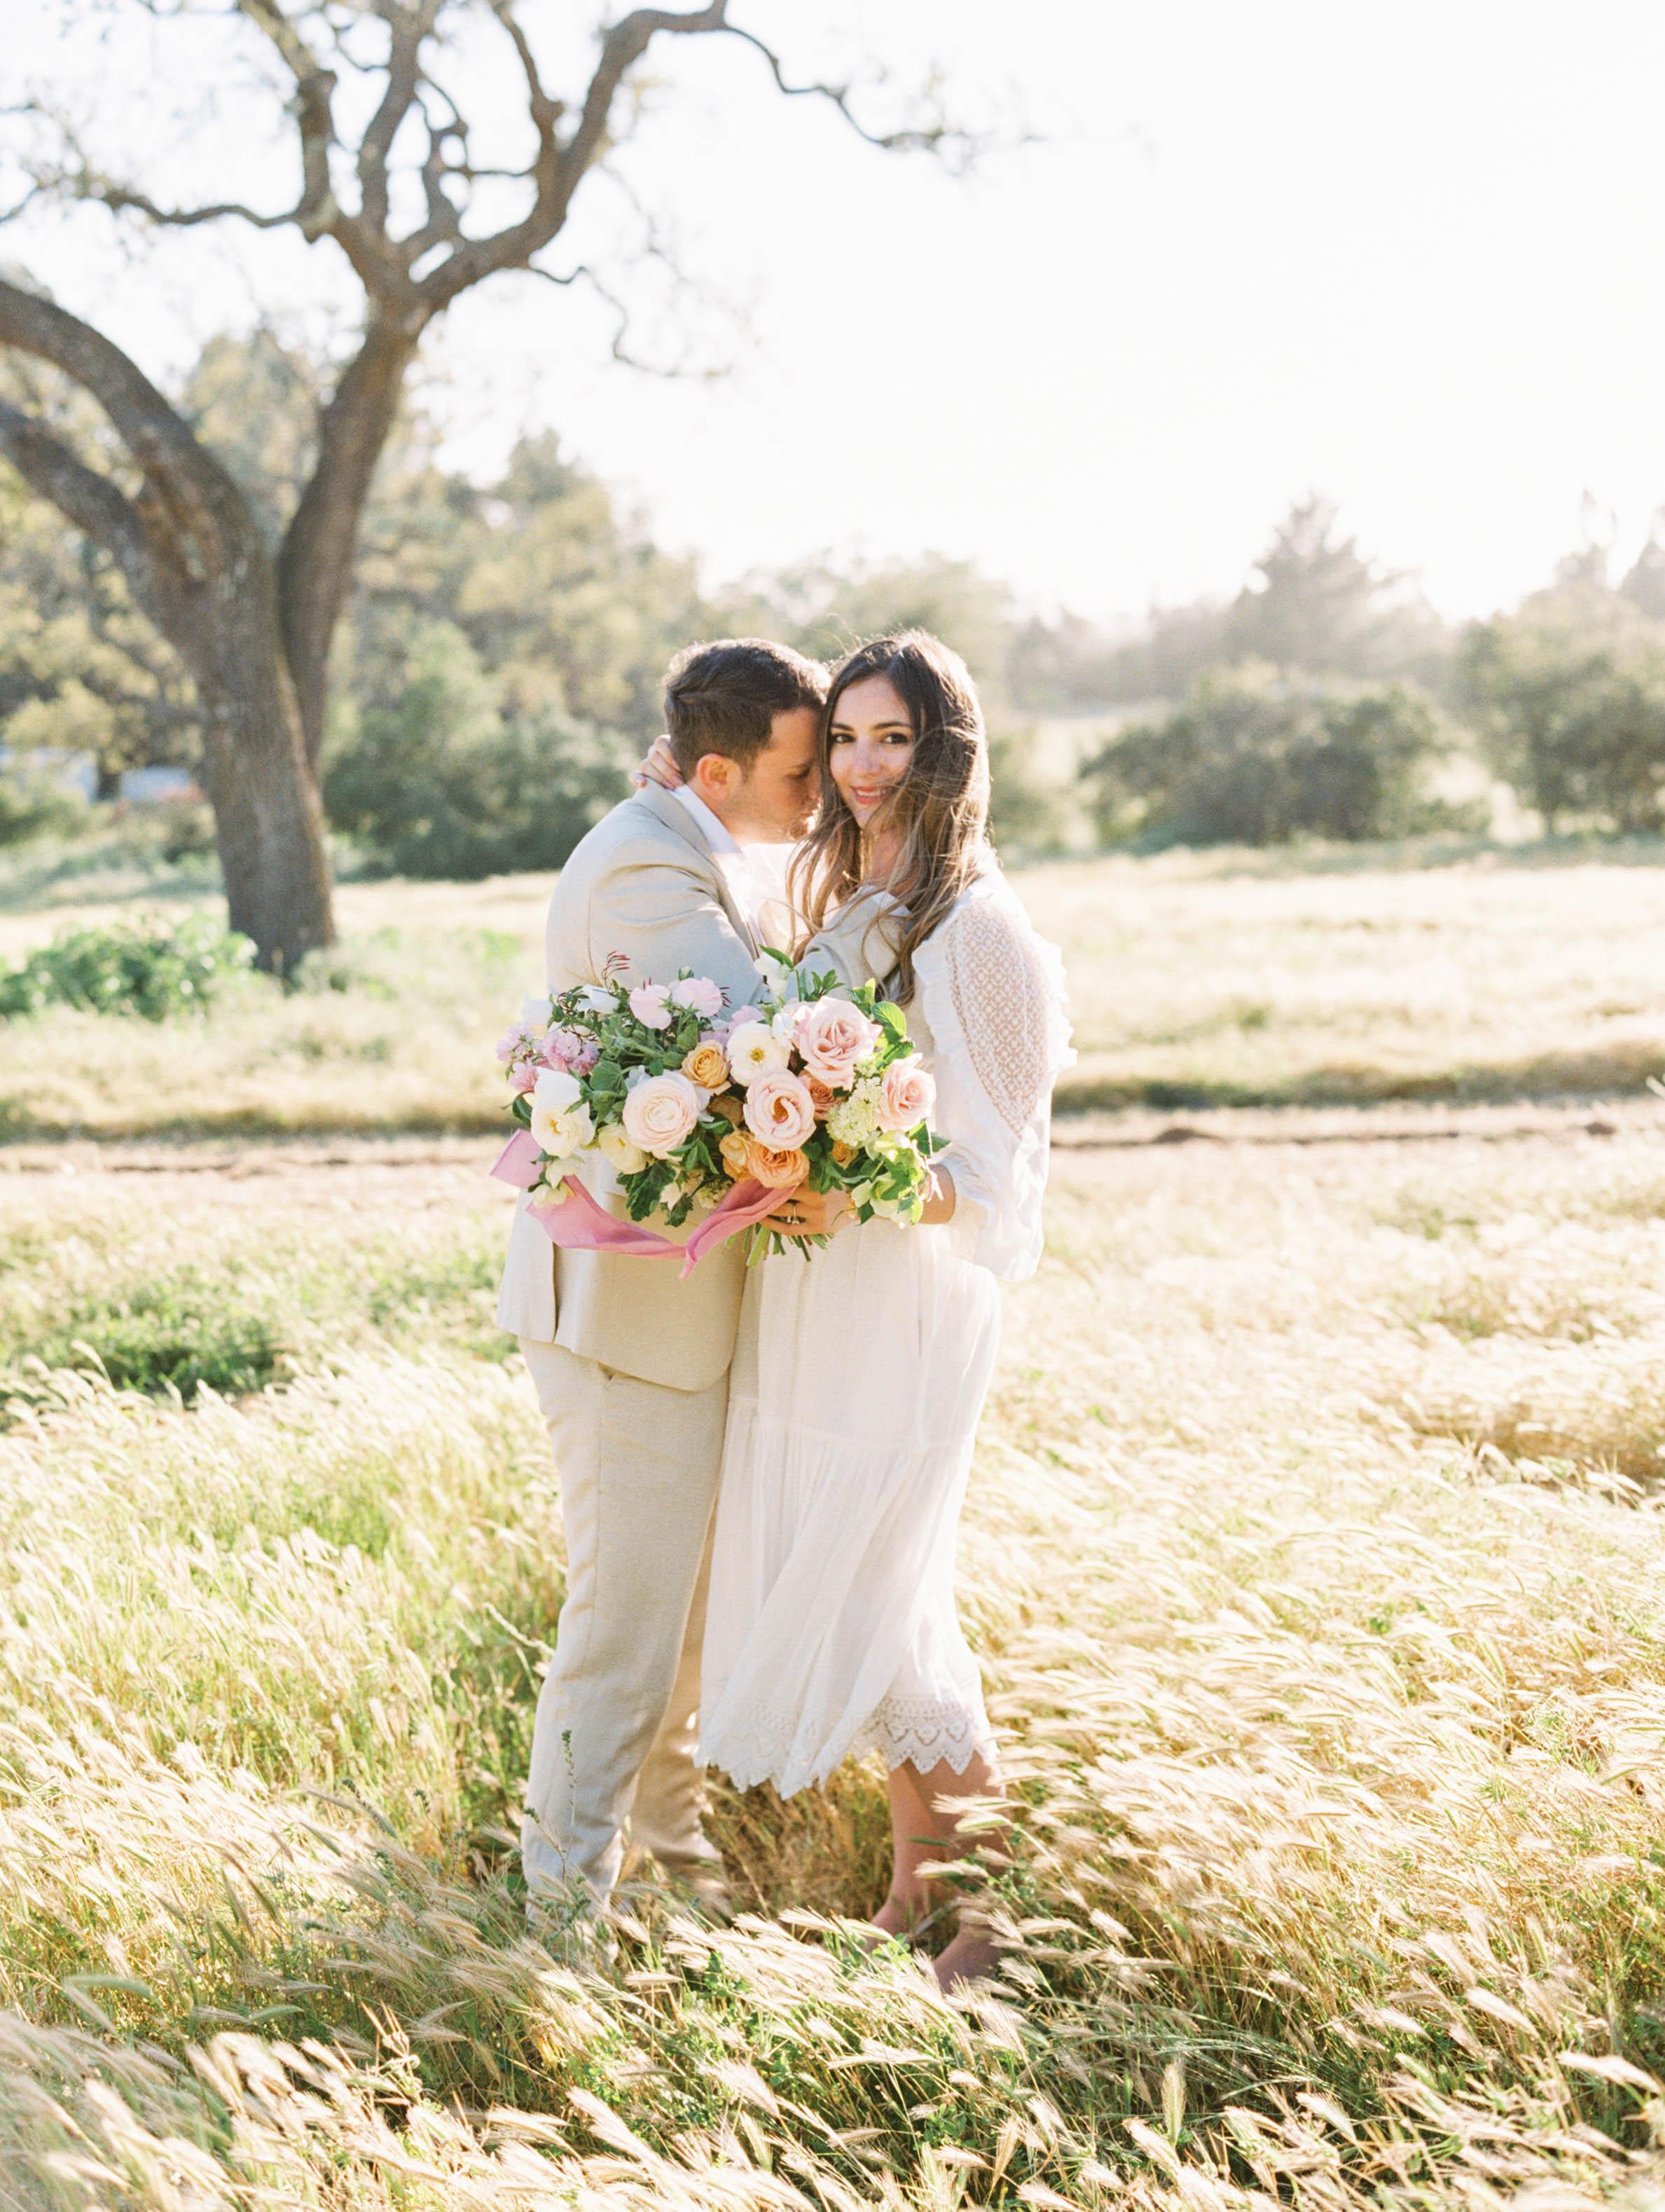 kelsandmichael_wedding_lieffranch-276.jpg